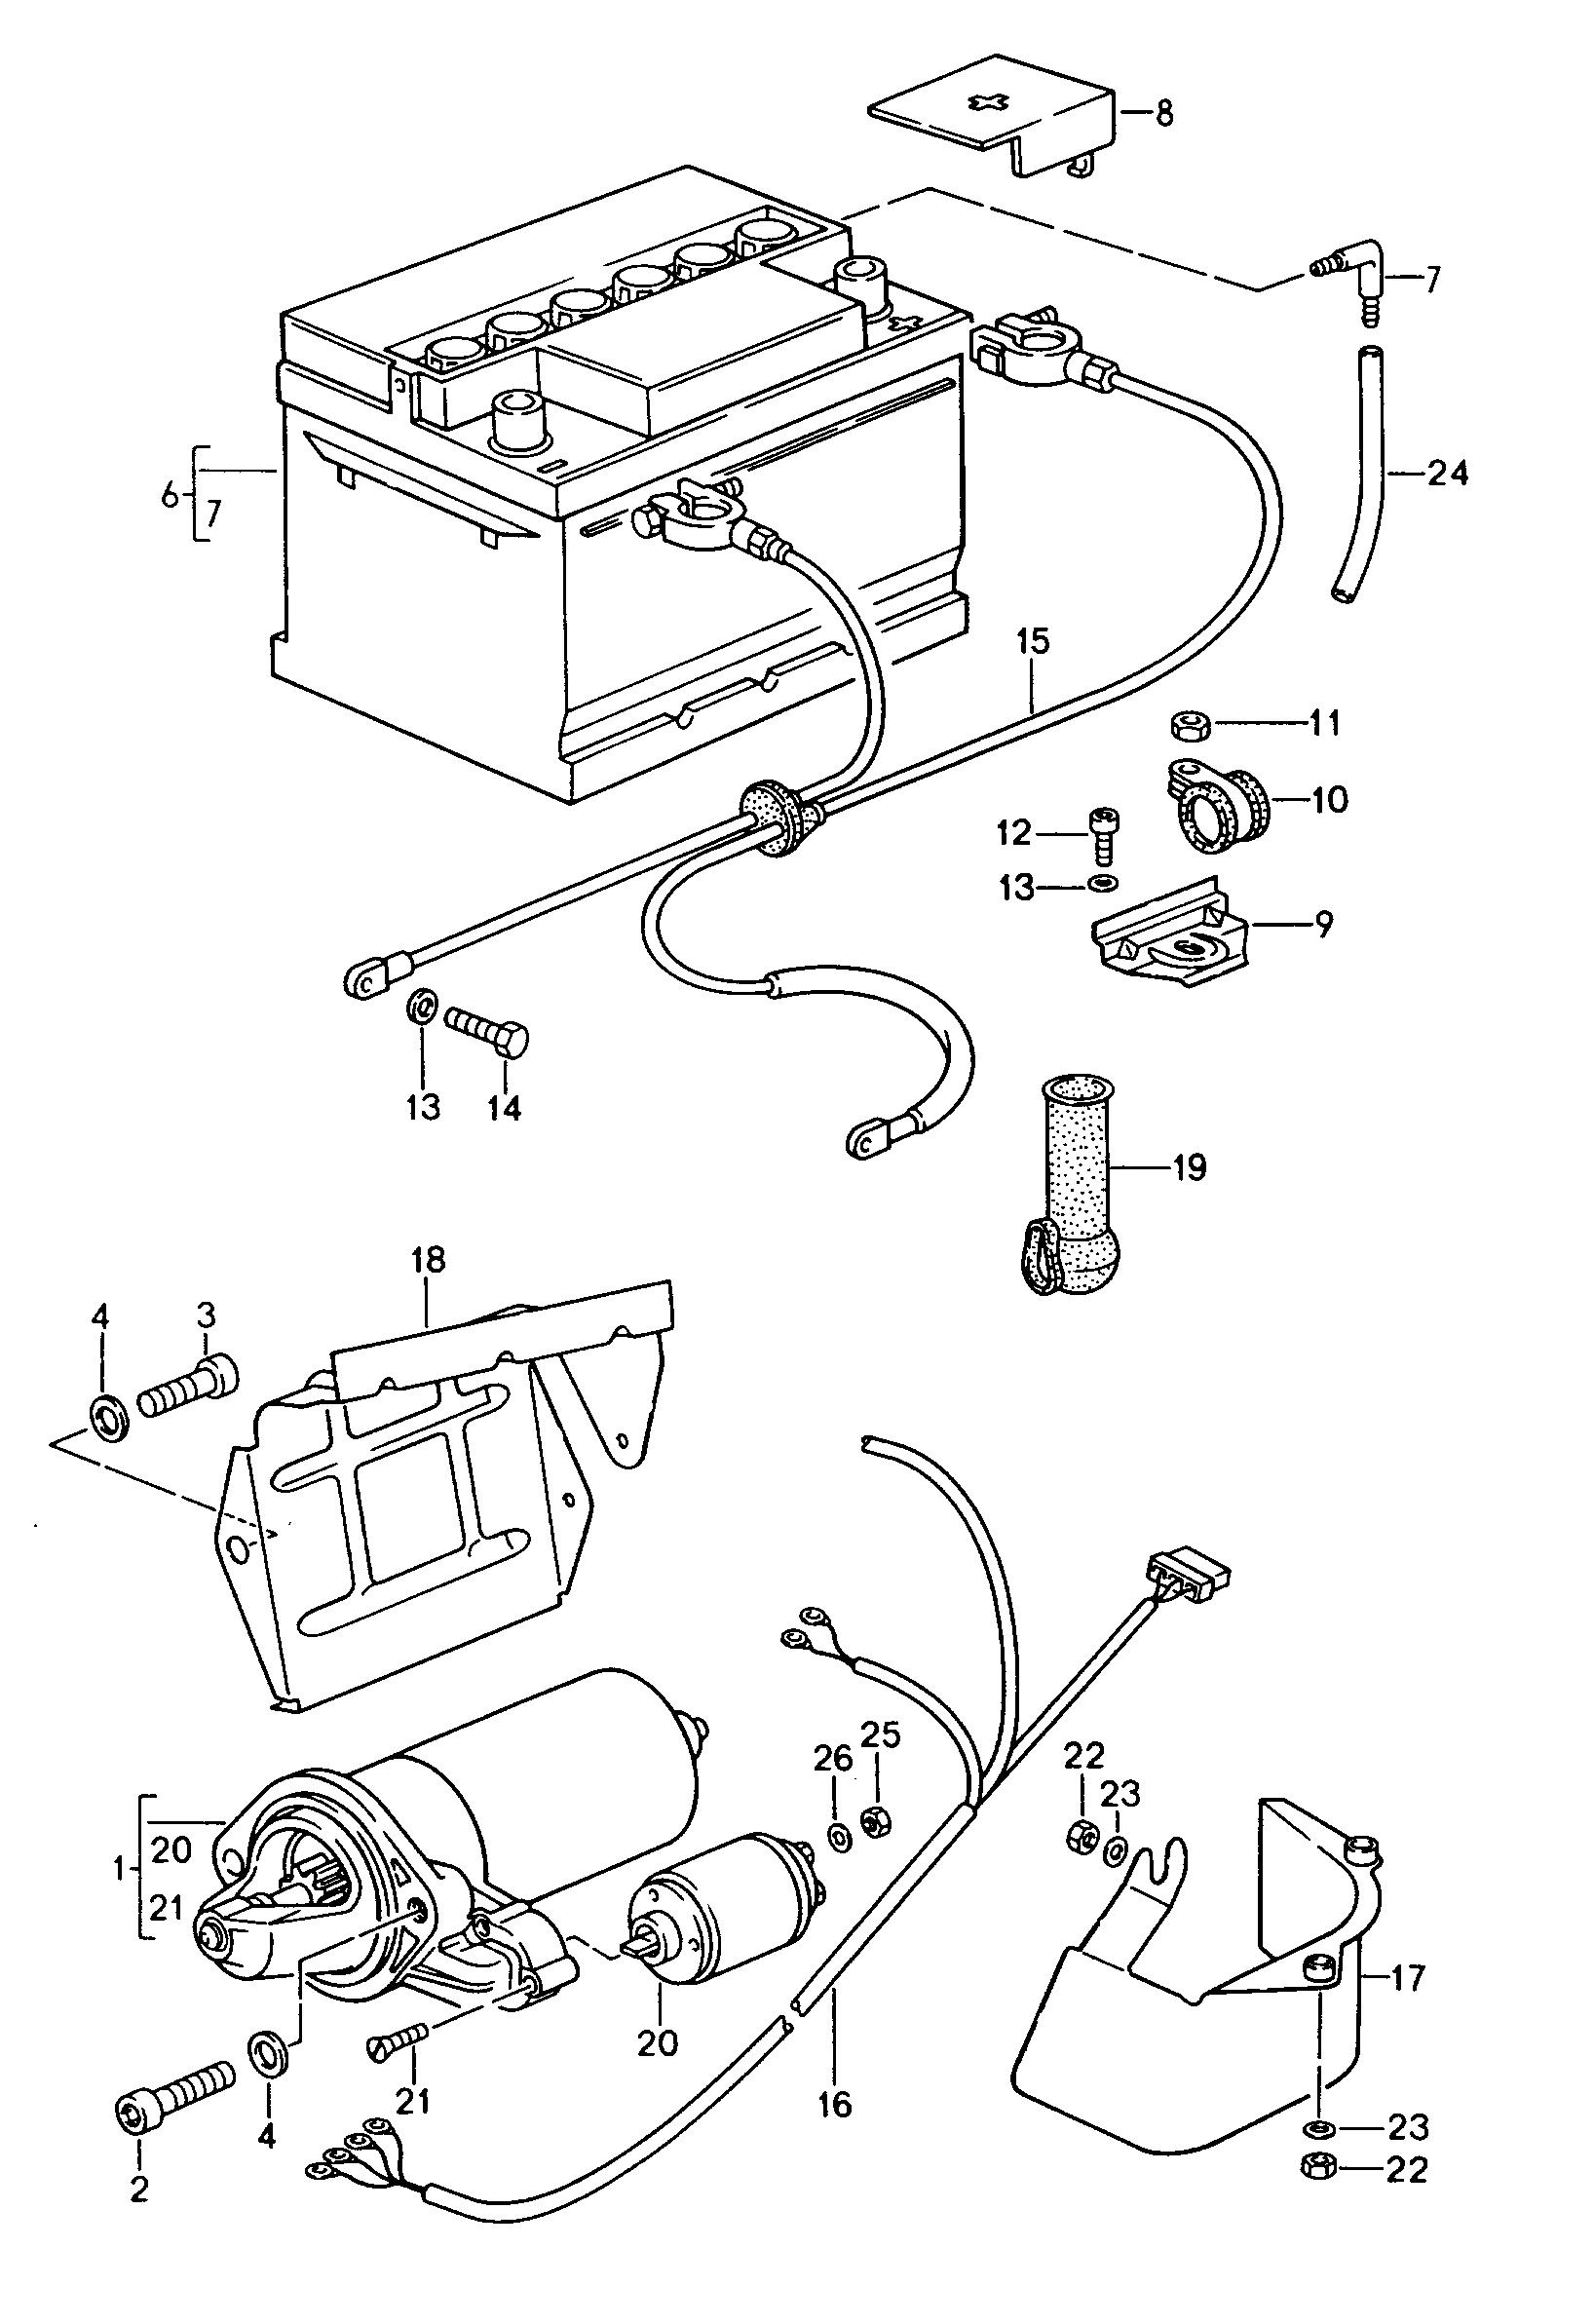 Porsche Starter Wiring Archive Of Automotive Diagram 914 944 1989 1991 Battery Harnesses Rh Nemigaparts Com